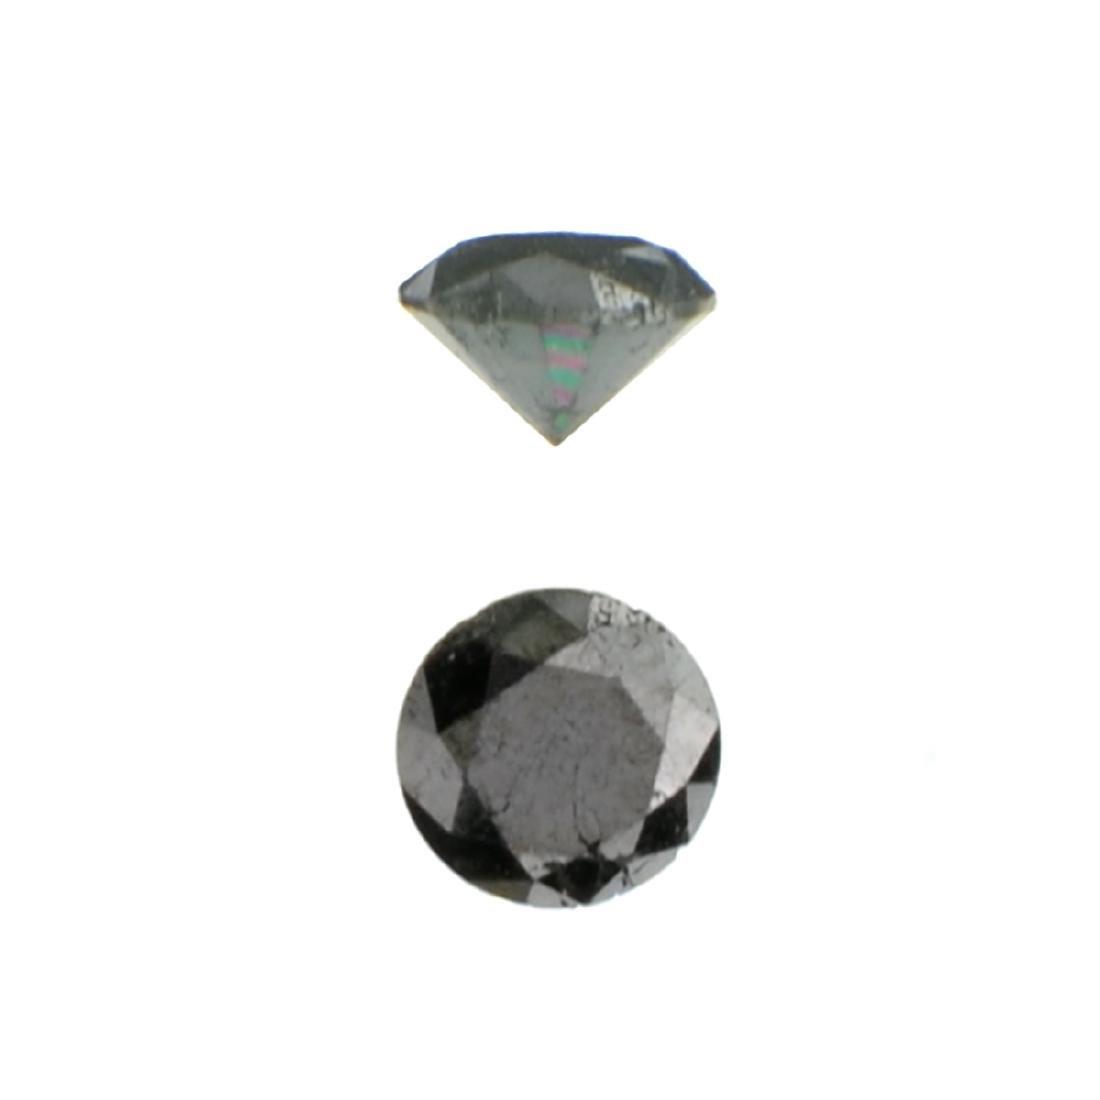 APP: 0.3k 0.41CT Round Cut Black Diamond Gemstone